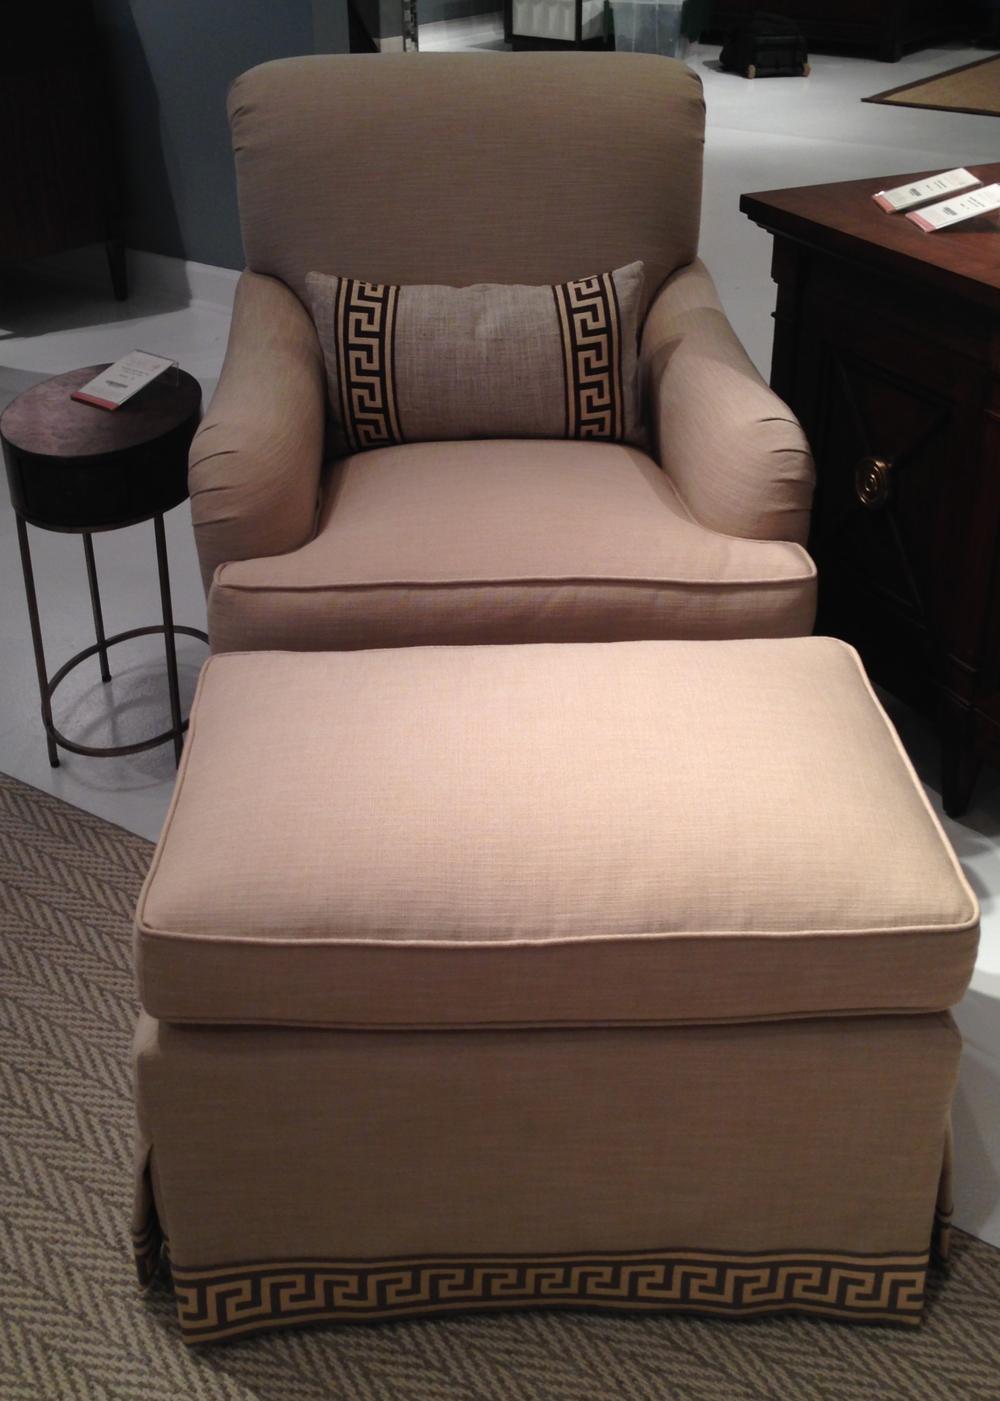 Ambella chair and ottoman.jpg